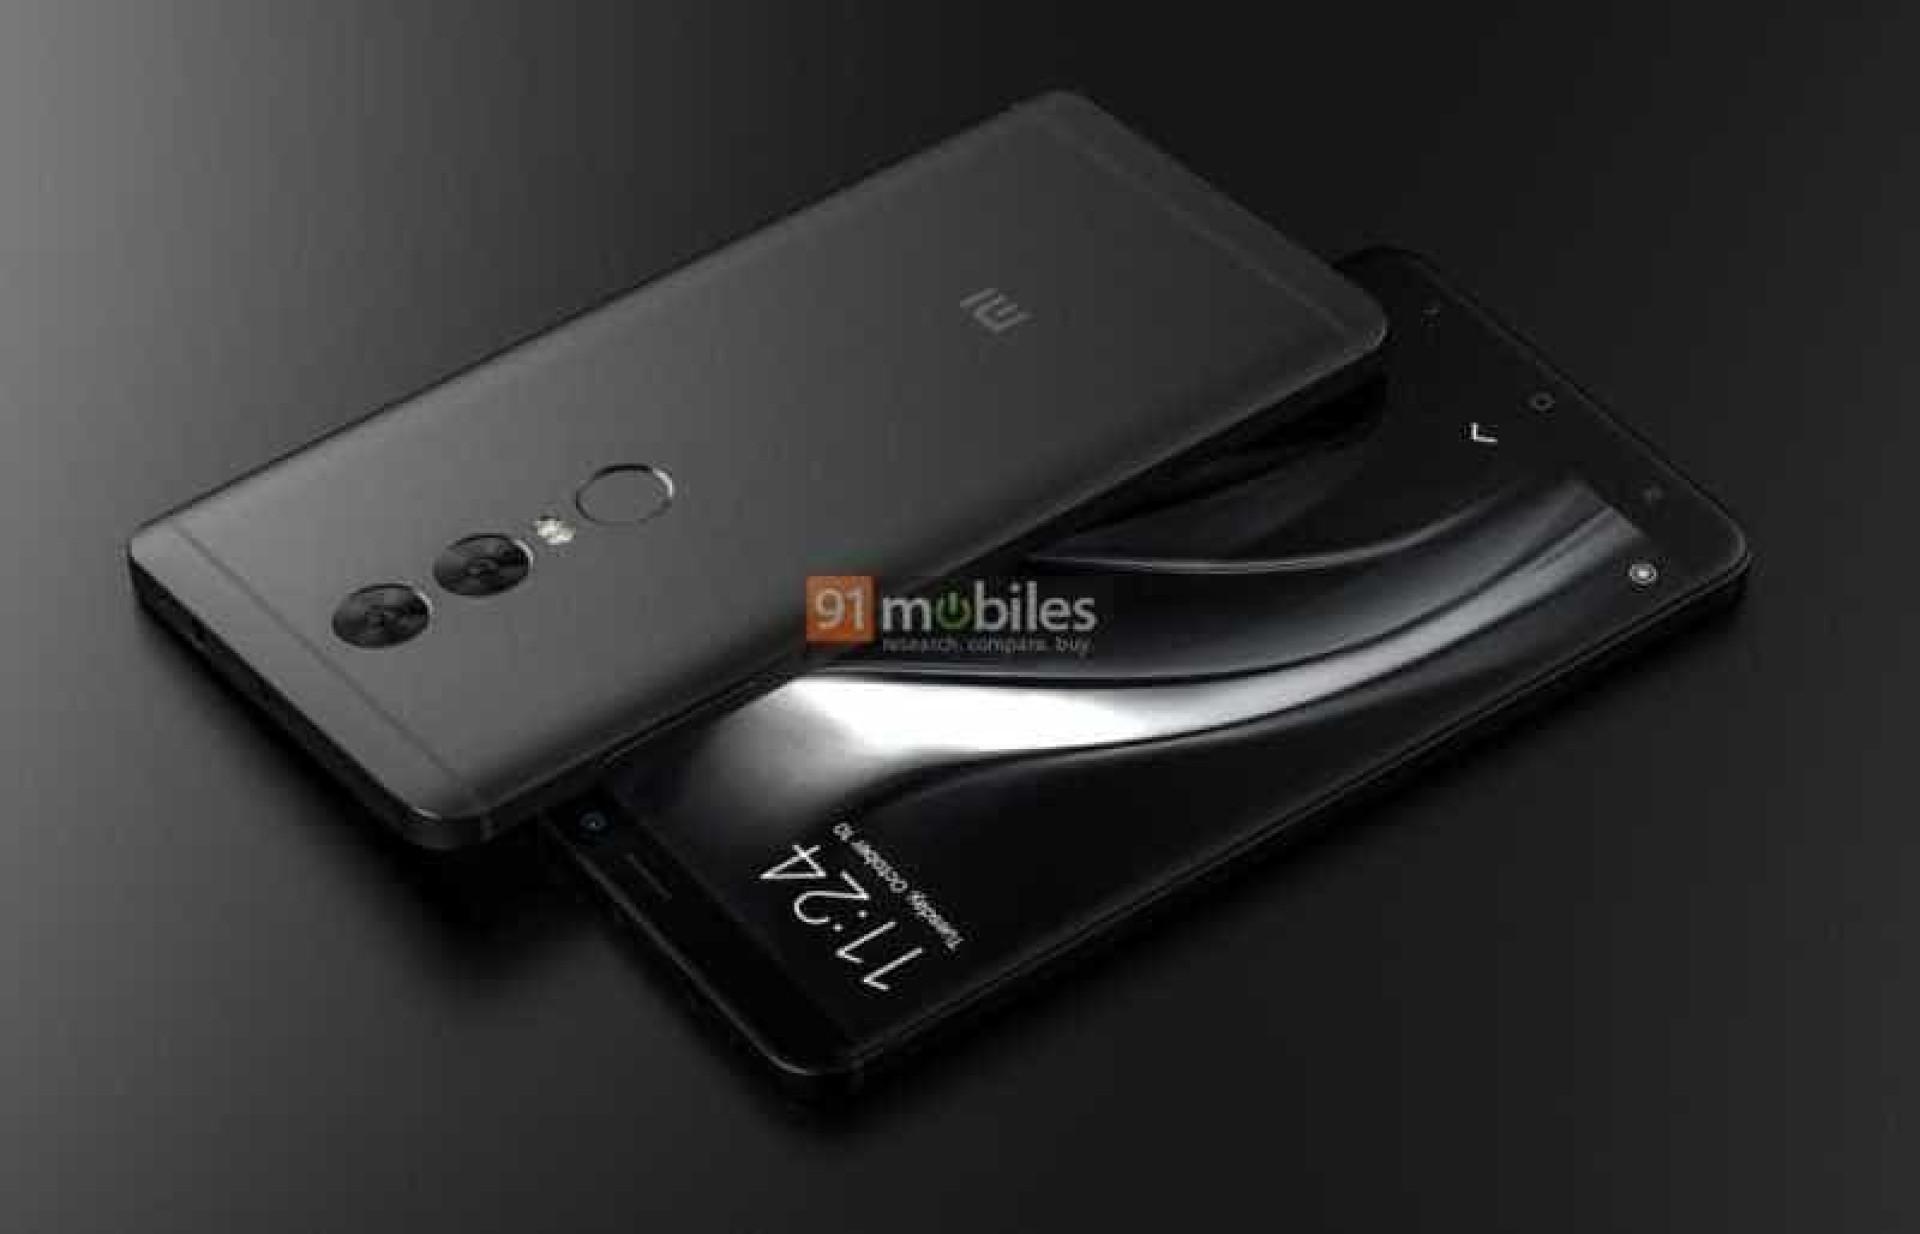 A julgar pelos rumores, o próximo Xiaomi terá este aspeto